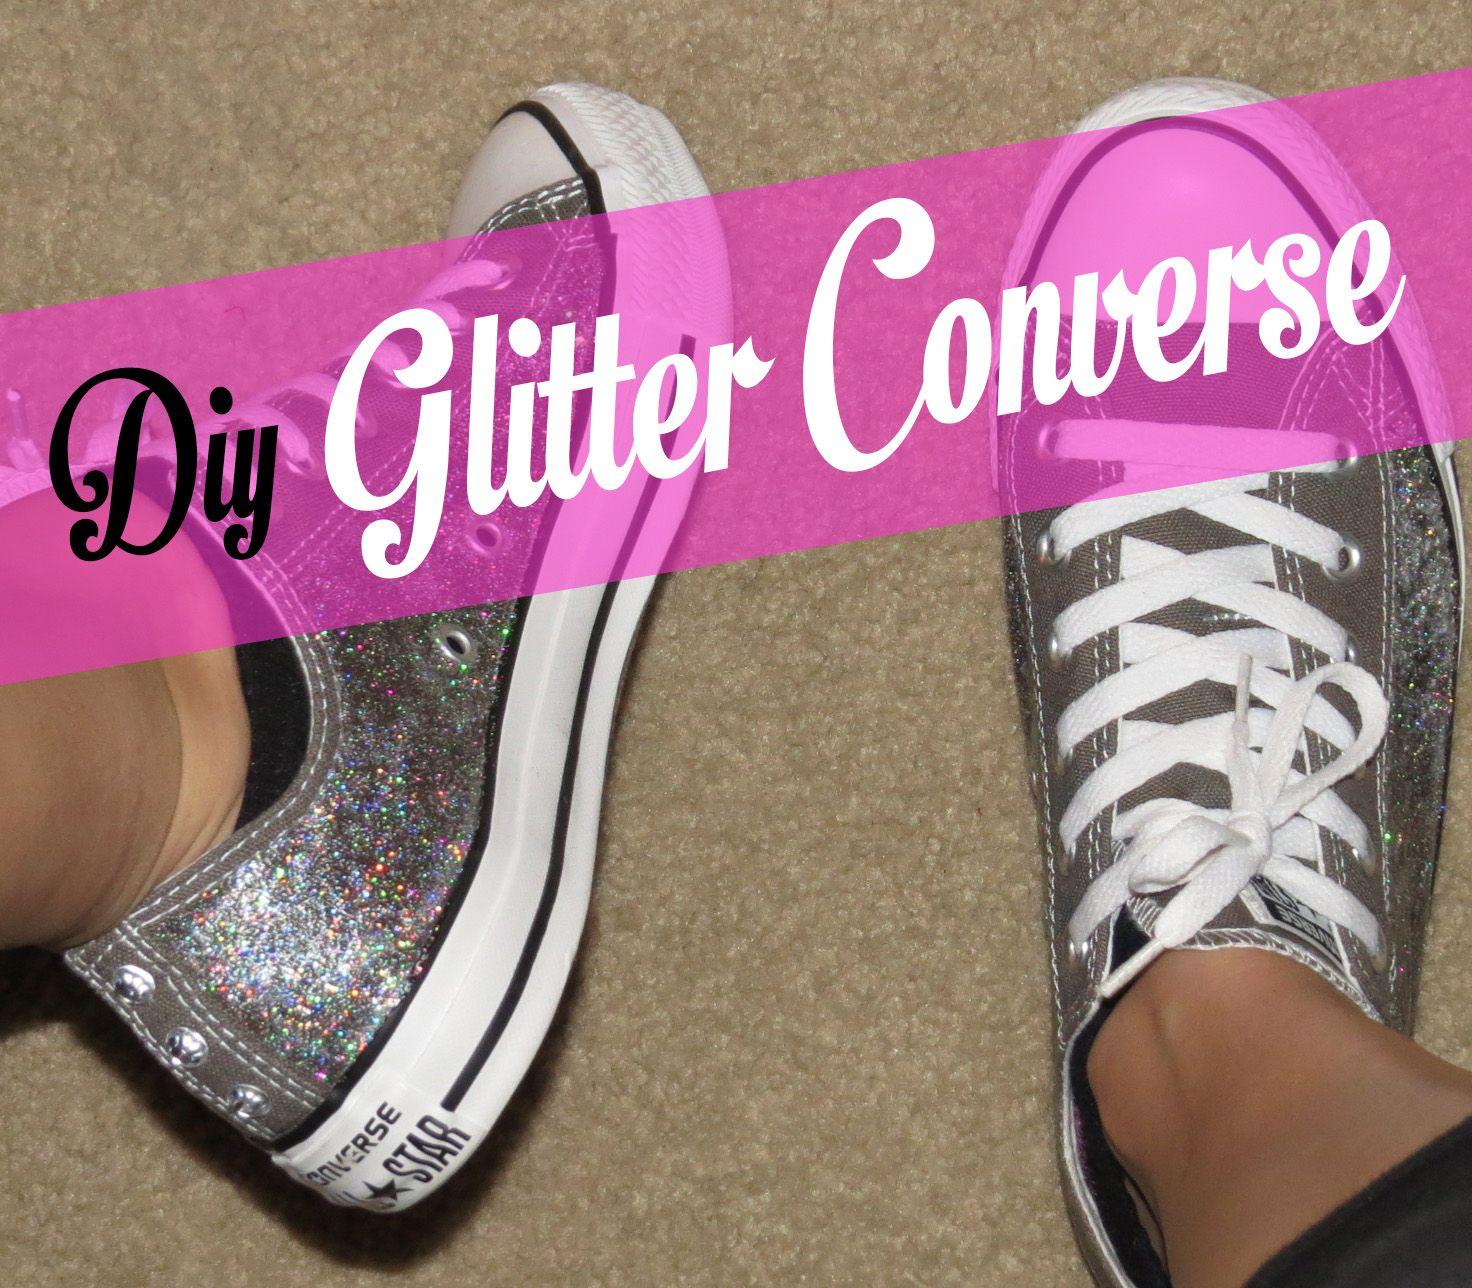 Diy Glitter Converse 2 Glitter Converse Glitter Diy Upcycle